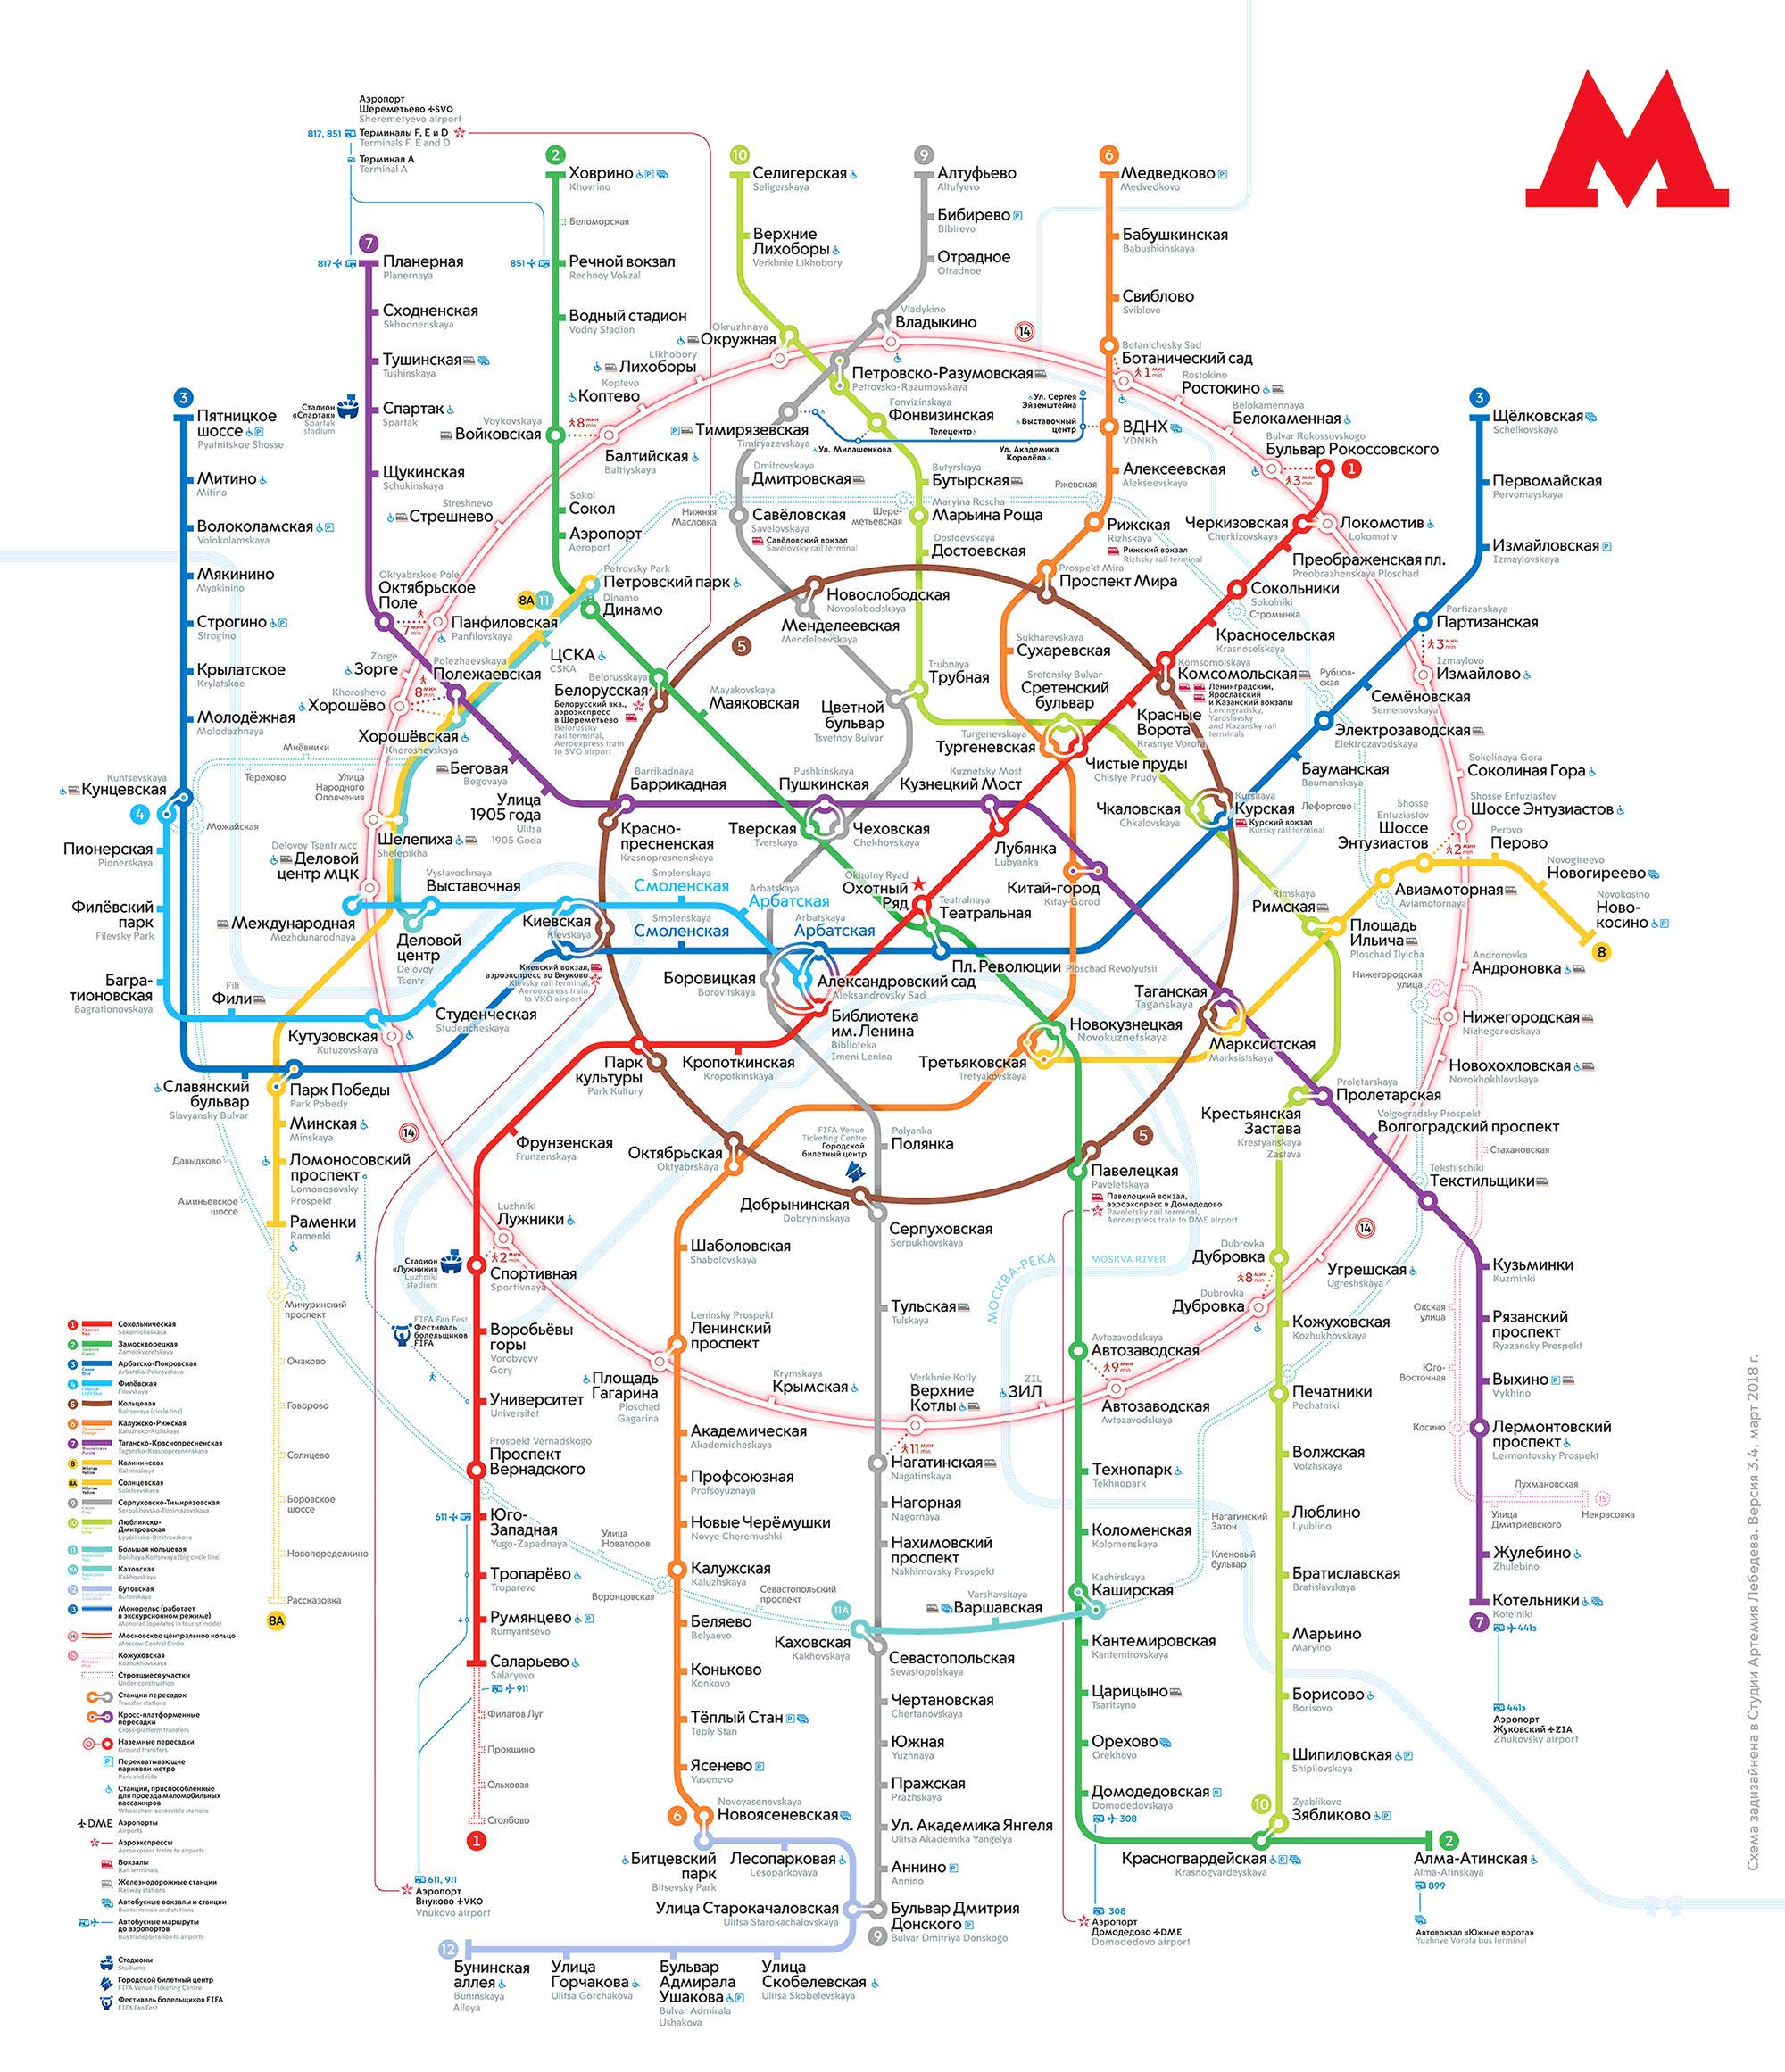 Схема Московского метро. Метро Фрязино Москва. Метро Москва Фрязино. Метро до Фрязино